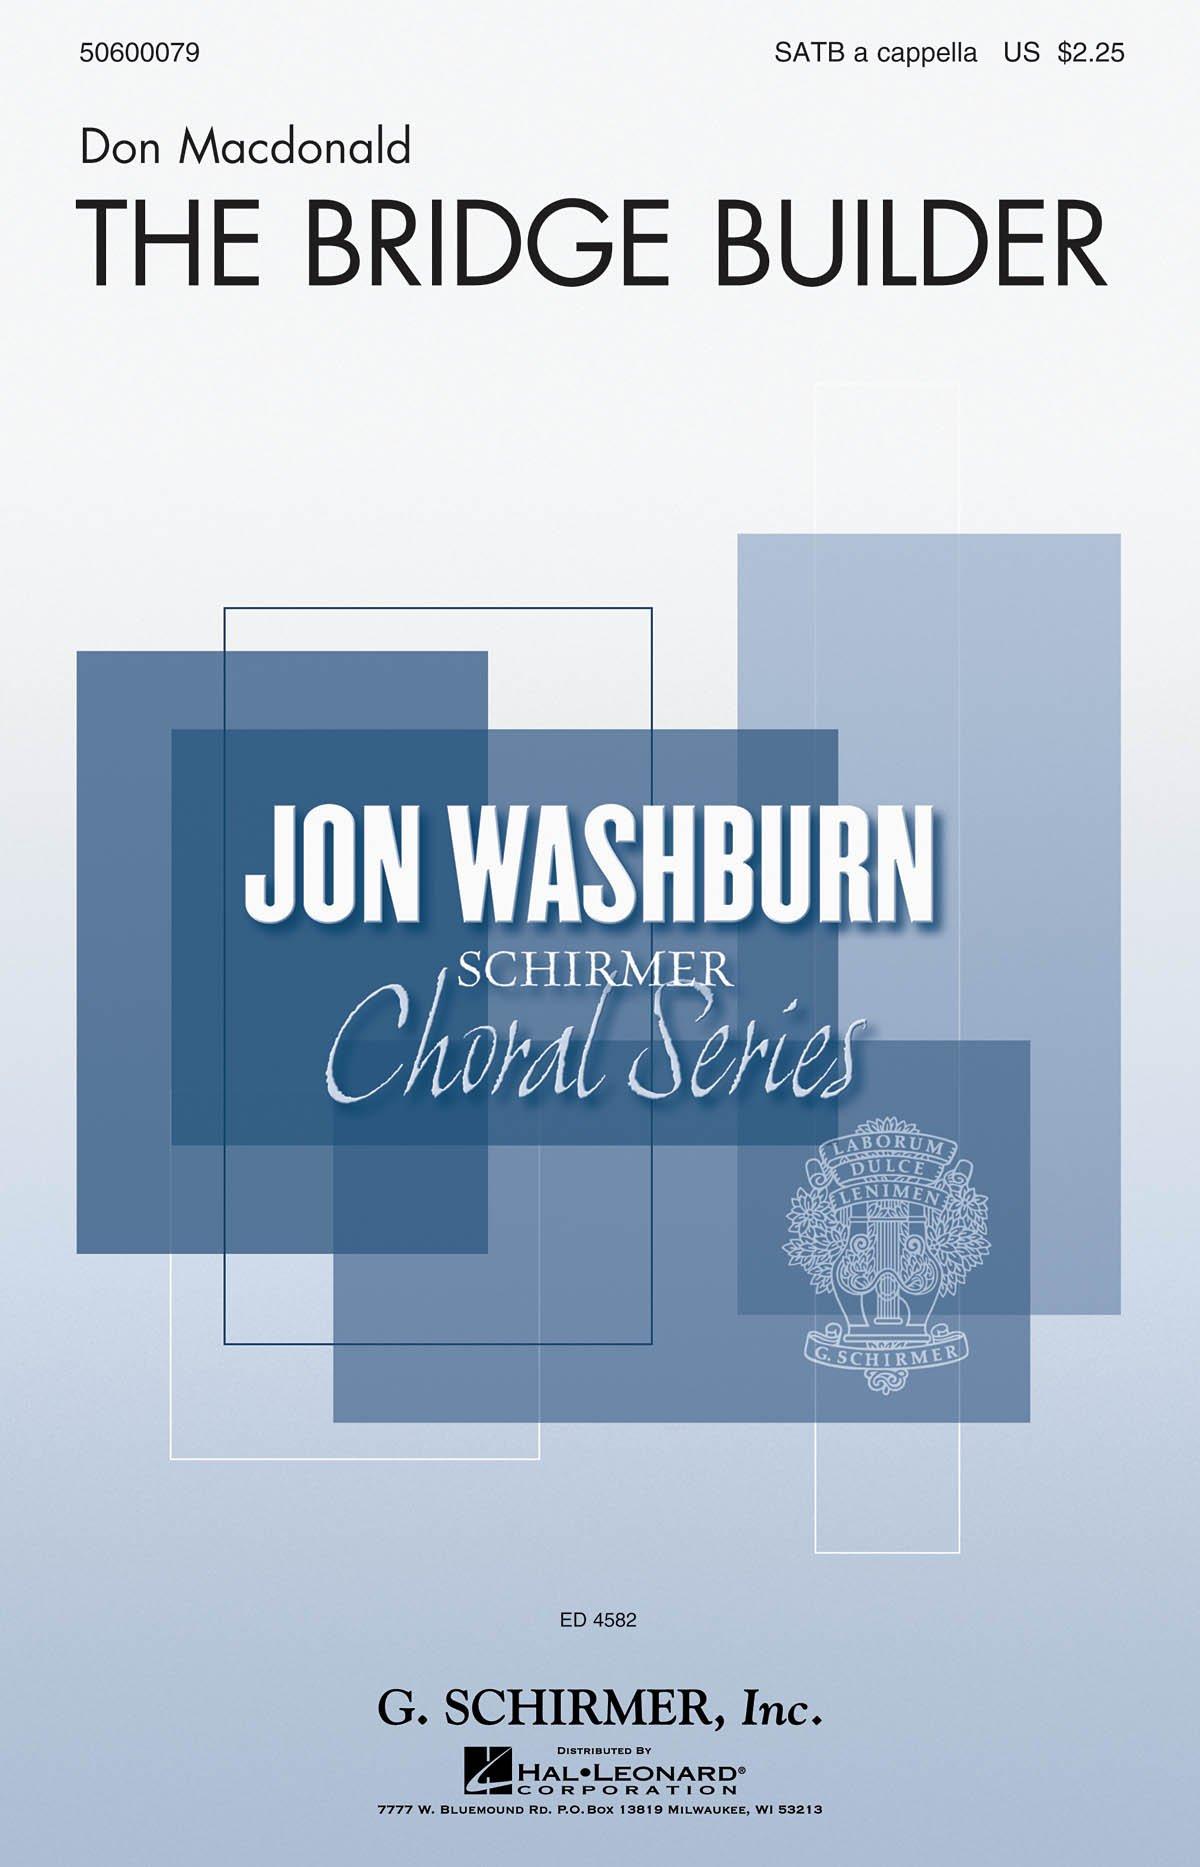 Download The Bridge Builder - Jon Washburn Choral Series - SATB divisi a cappella - SATB ACAPPEL - Sheet Music pdf